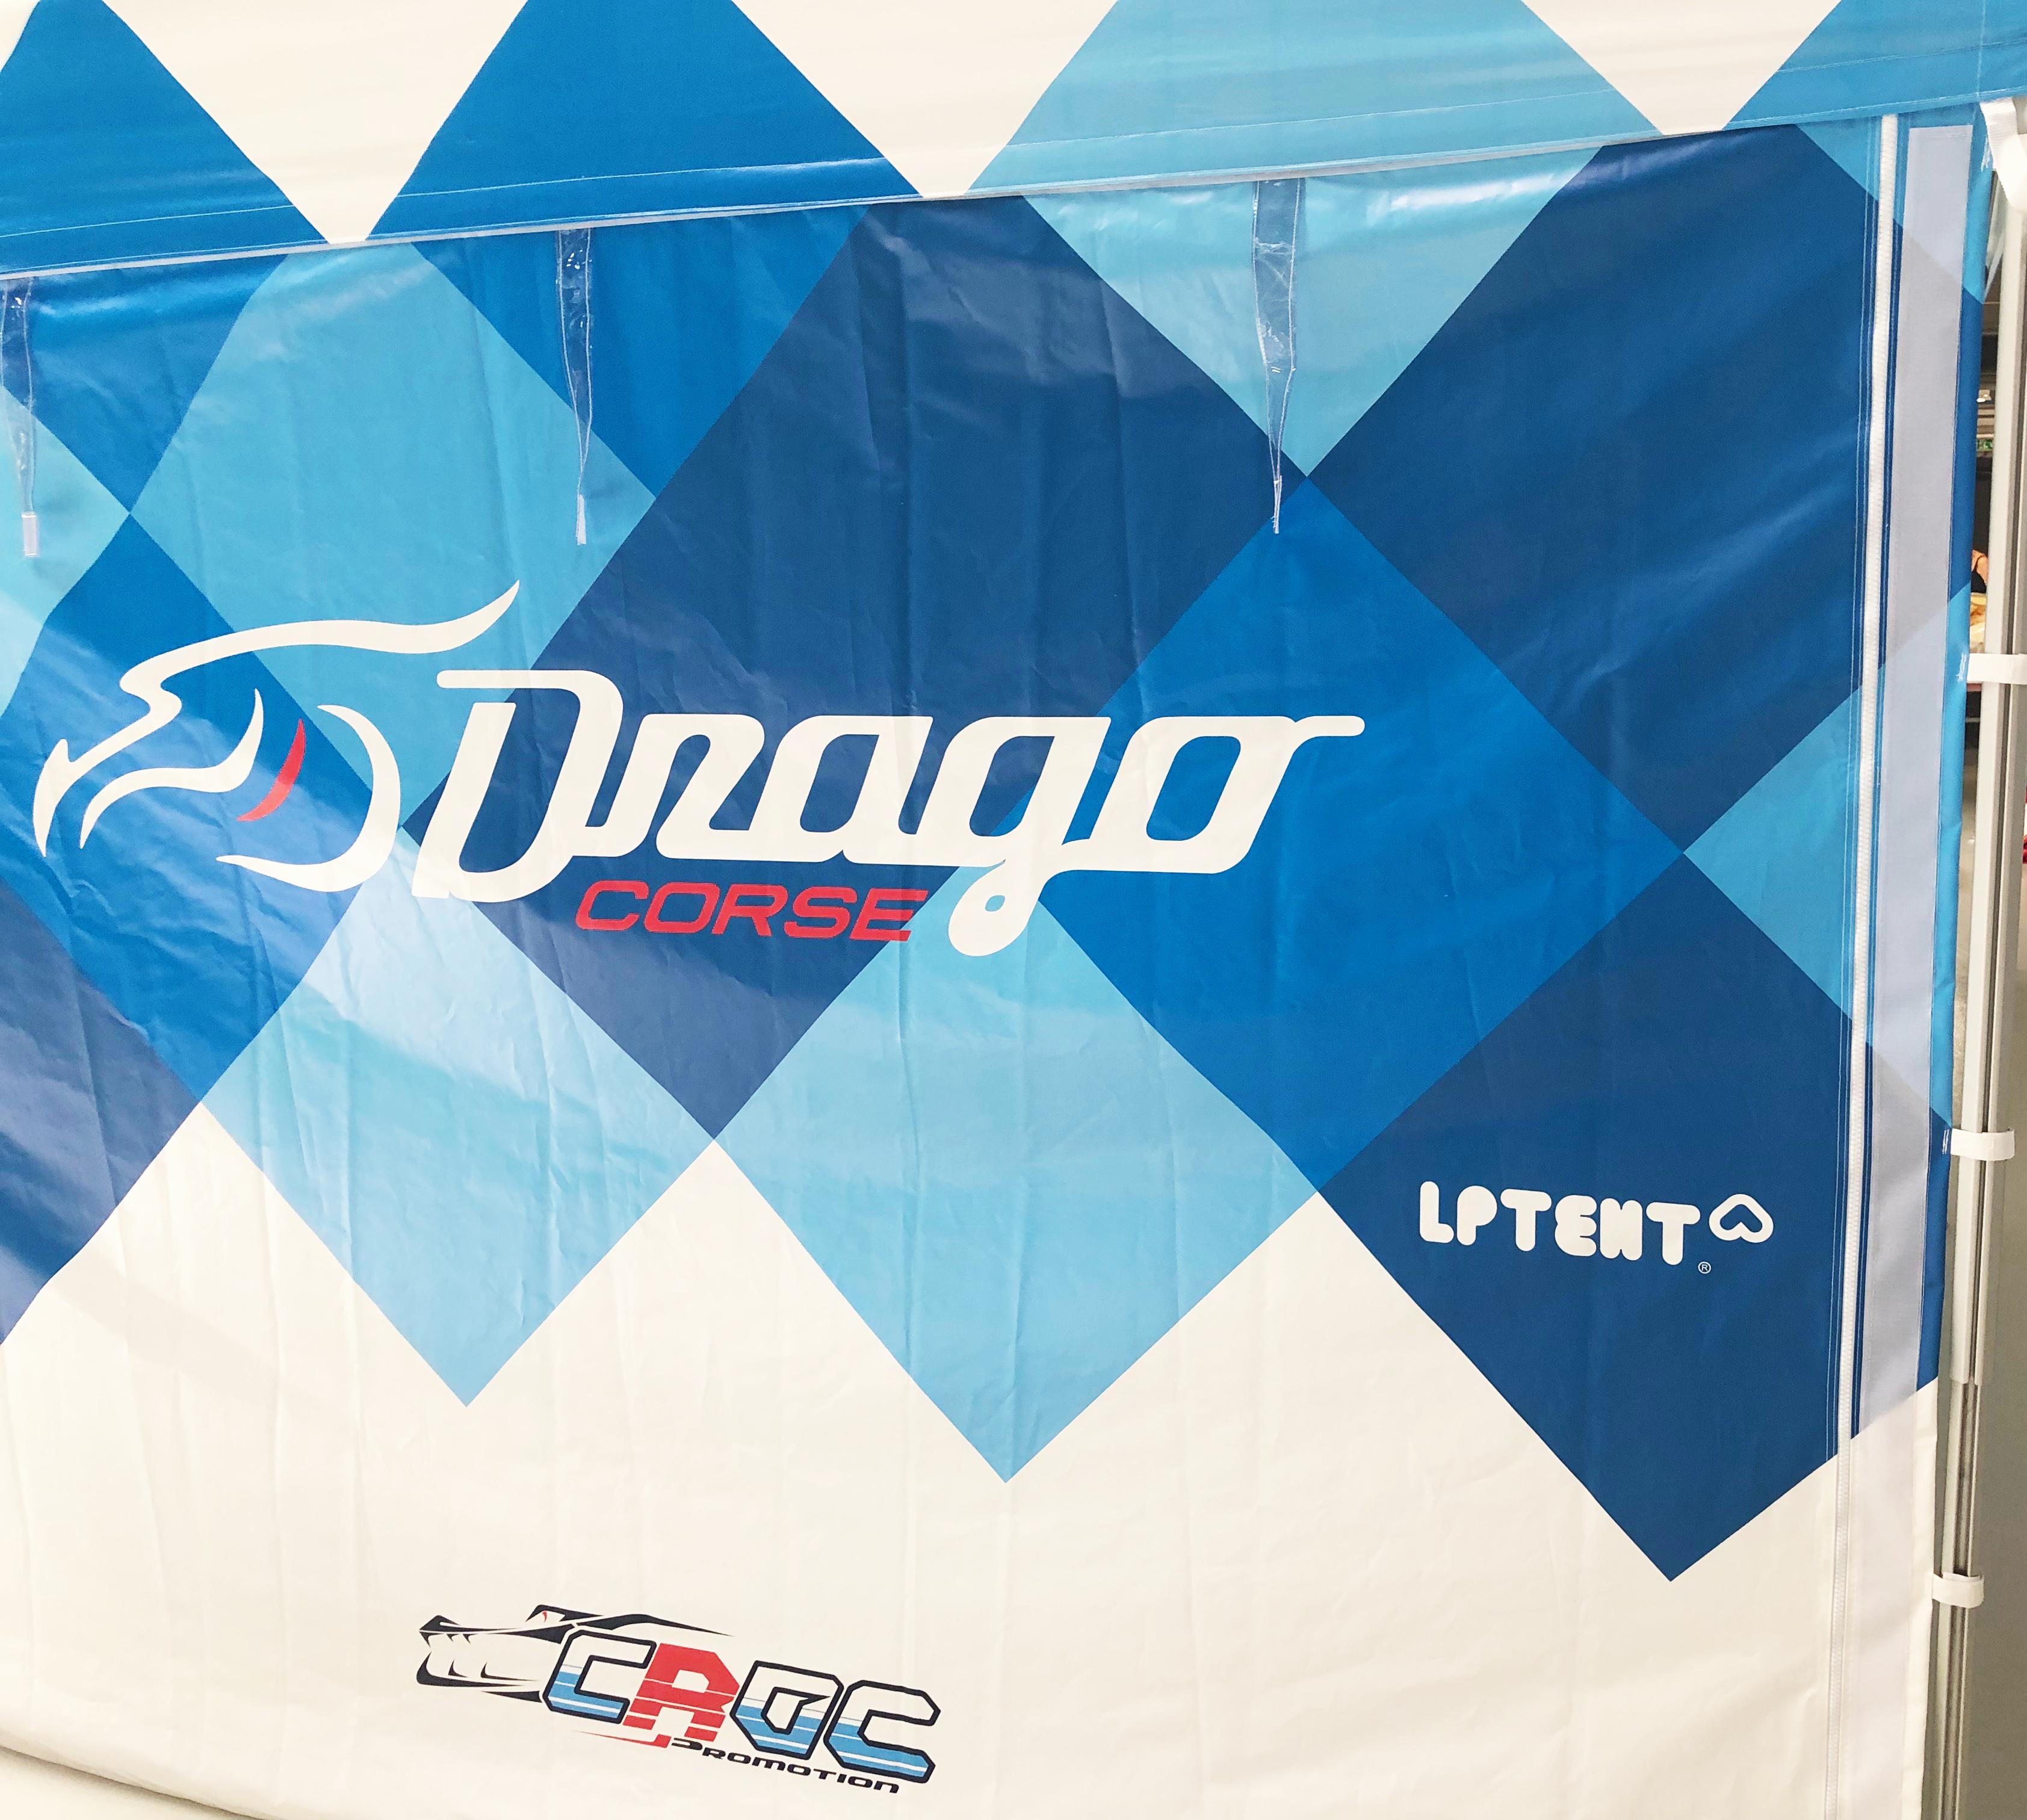 Mur paddock de course Drago Corse